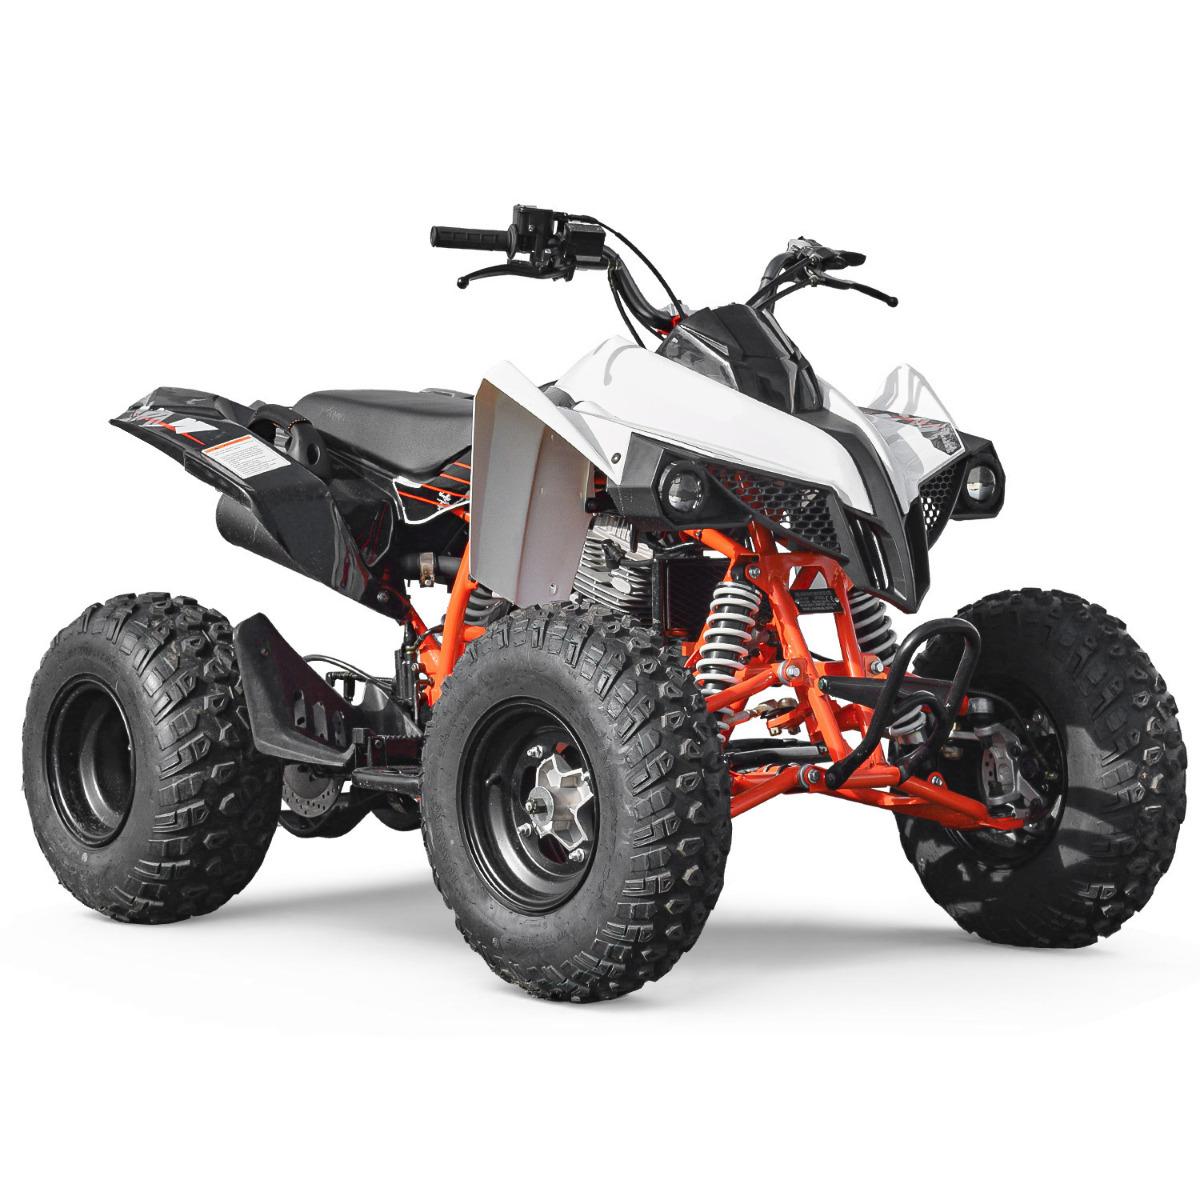 ASSASSIN AK250 ATV 250CC QUAD DIRT PIT BIKE GOKART 4 WHEELER BUGGY